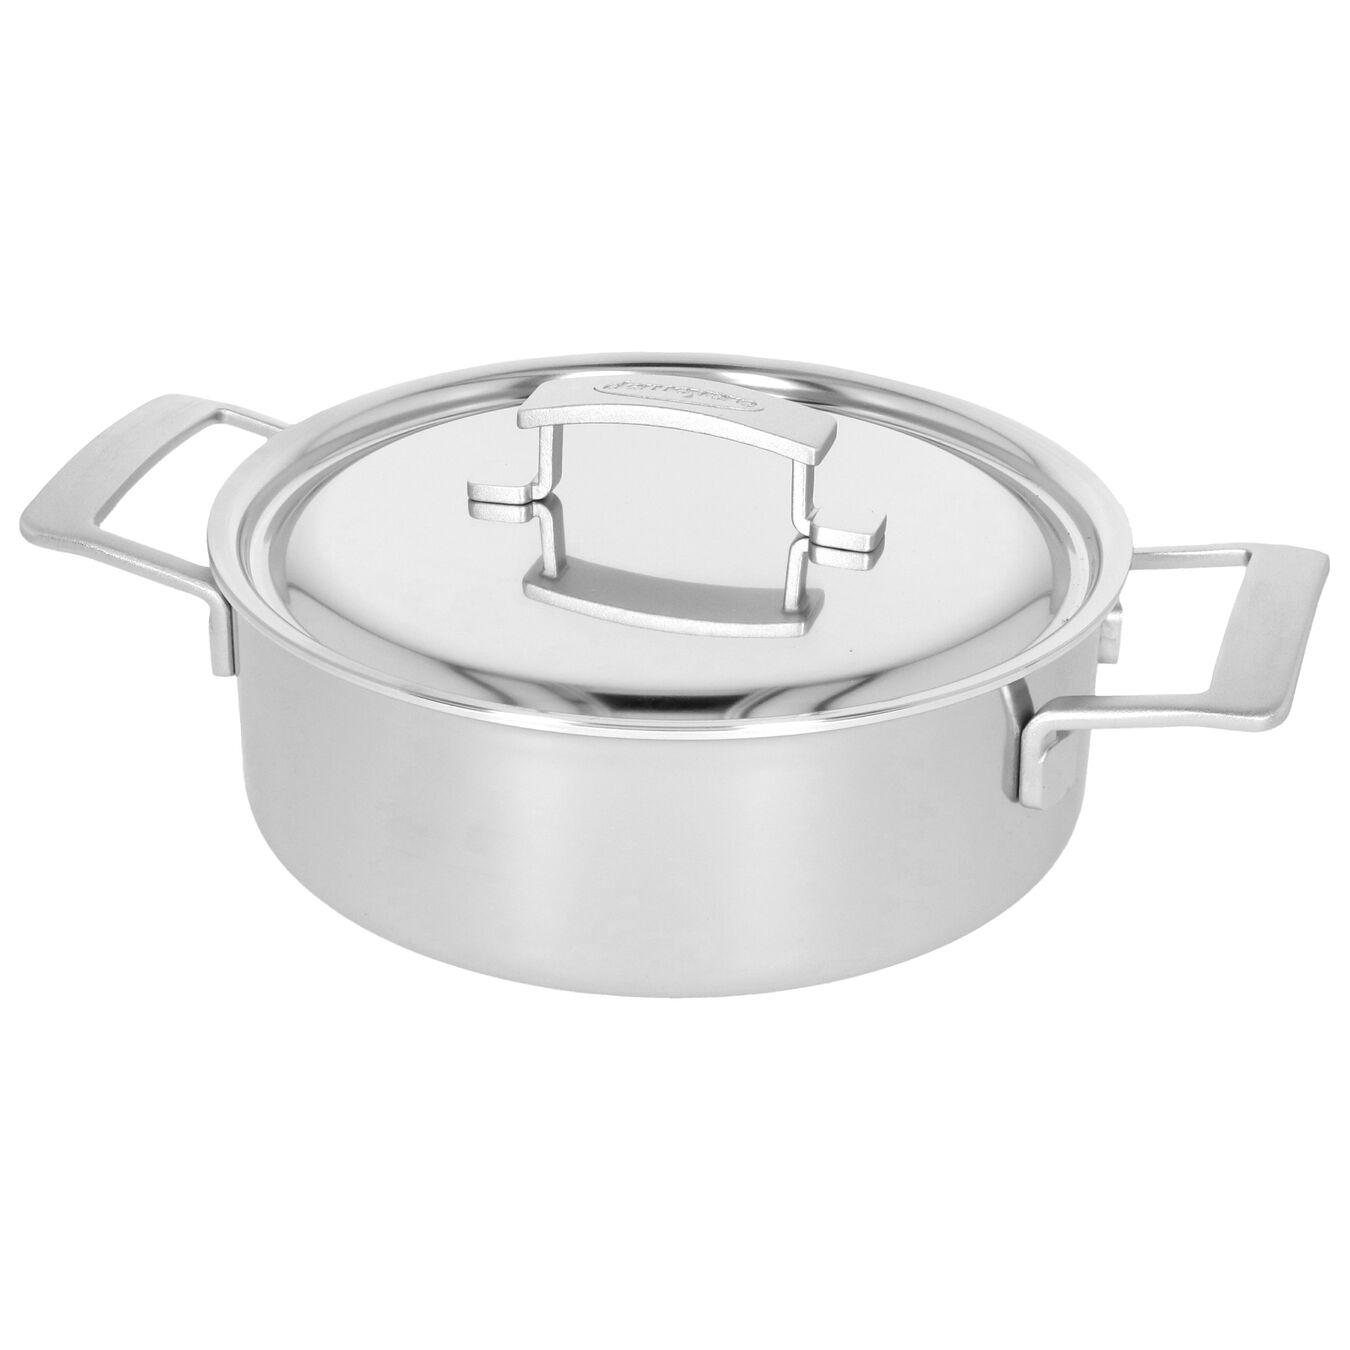 Kookpot met deksel, 24 cm / 3,8 l,,large 3